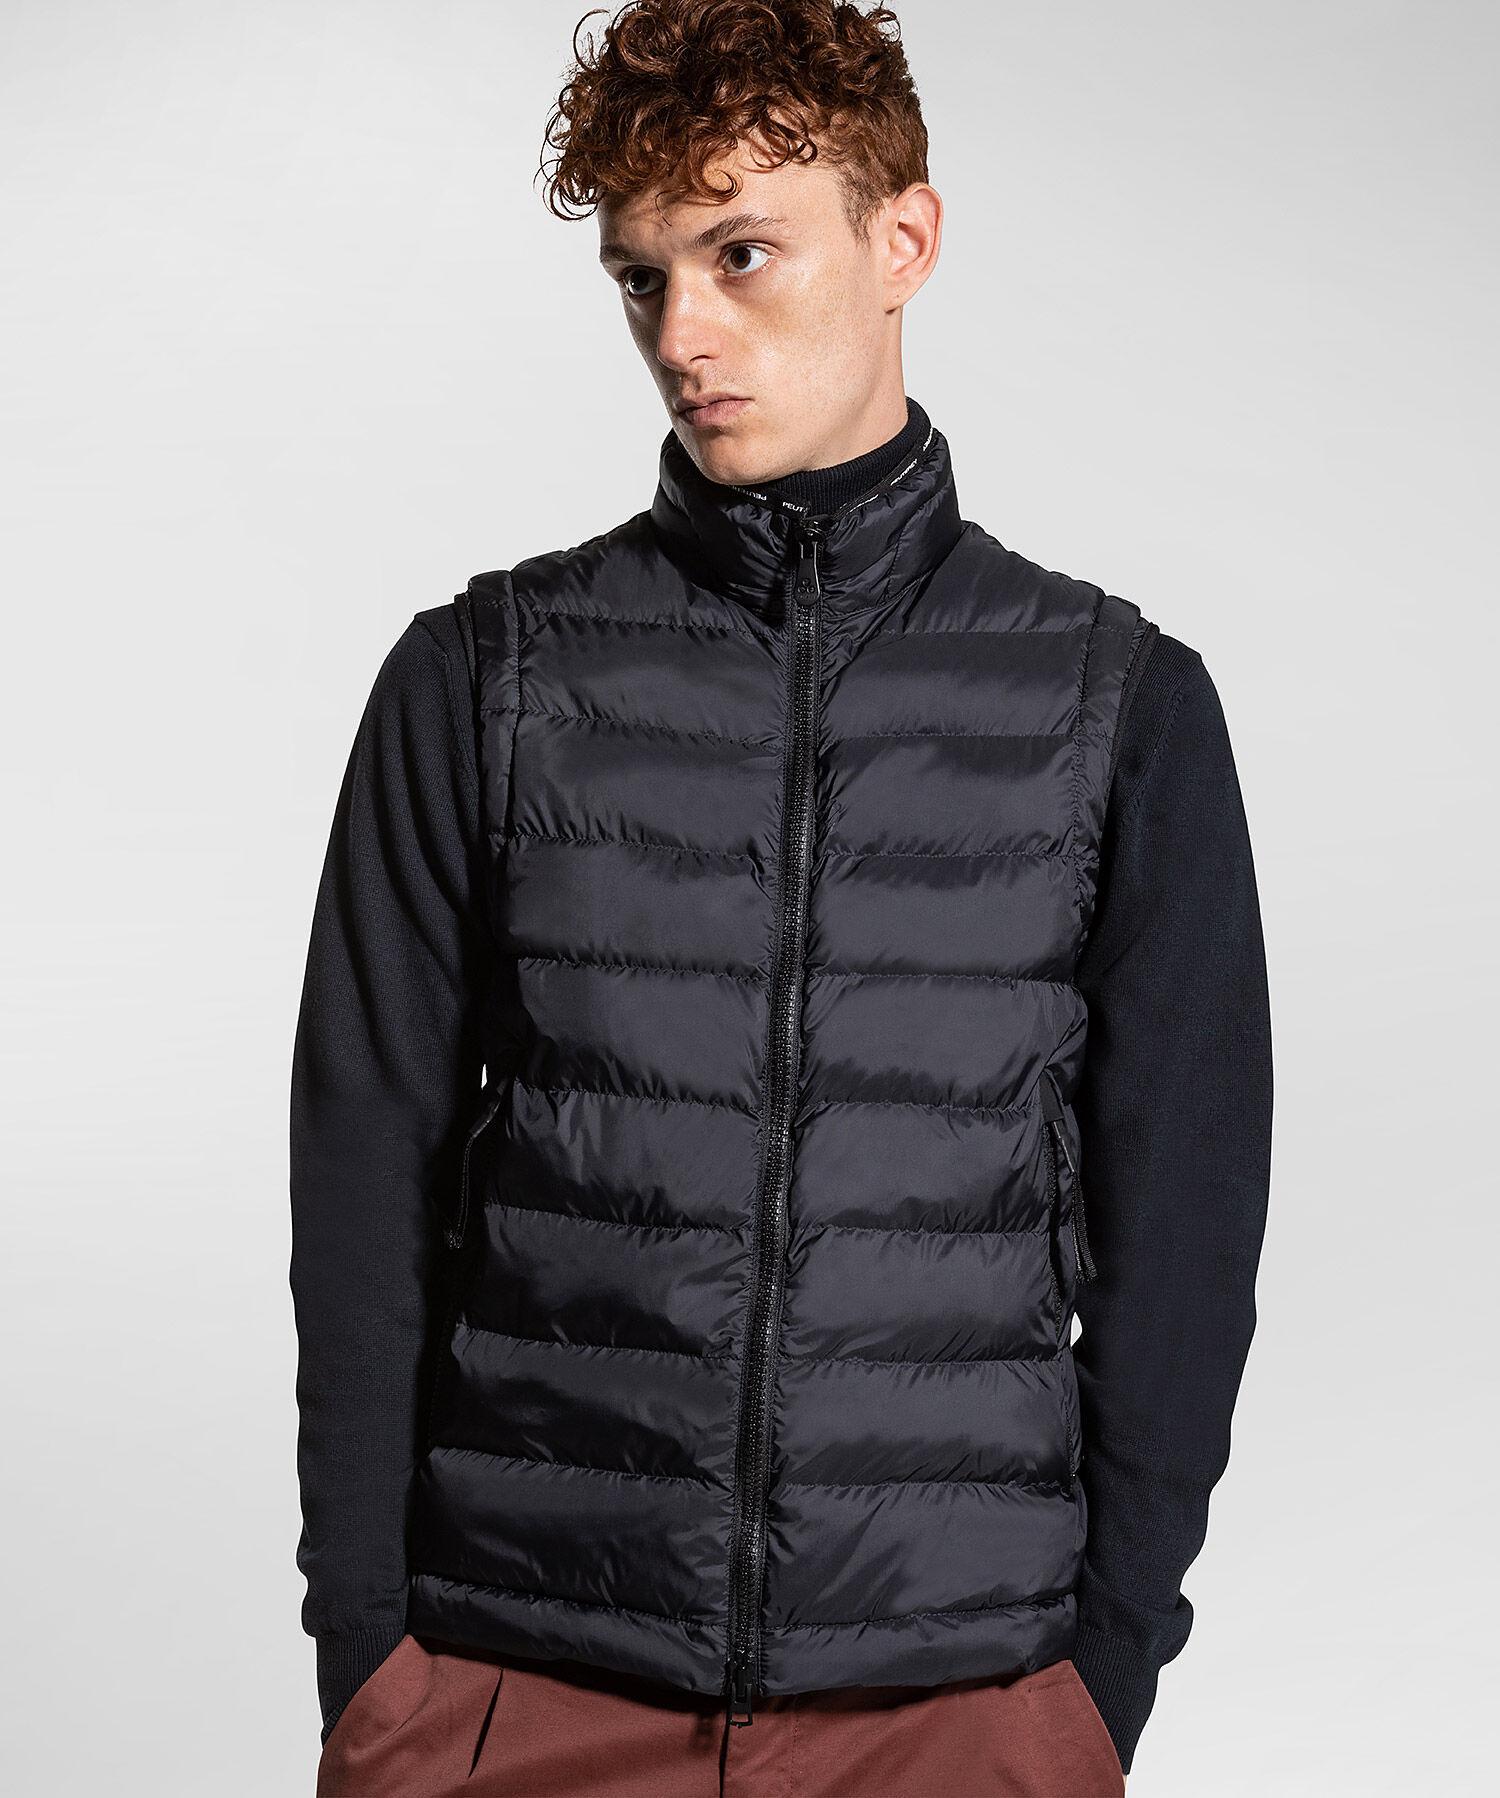 Superlight and semi-opaque vest - Peuterey